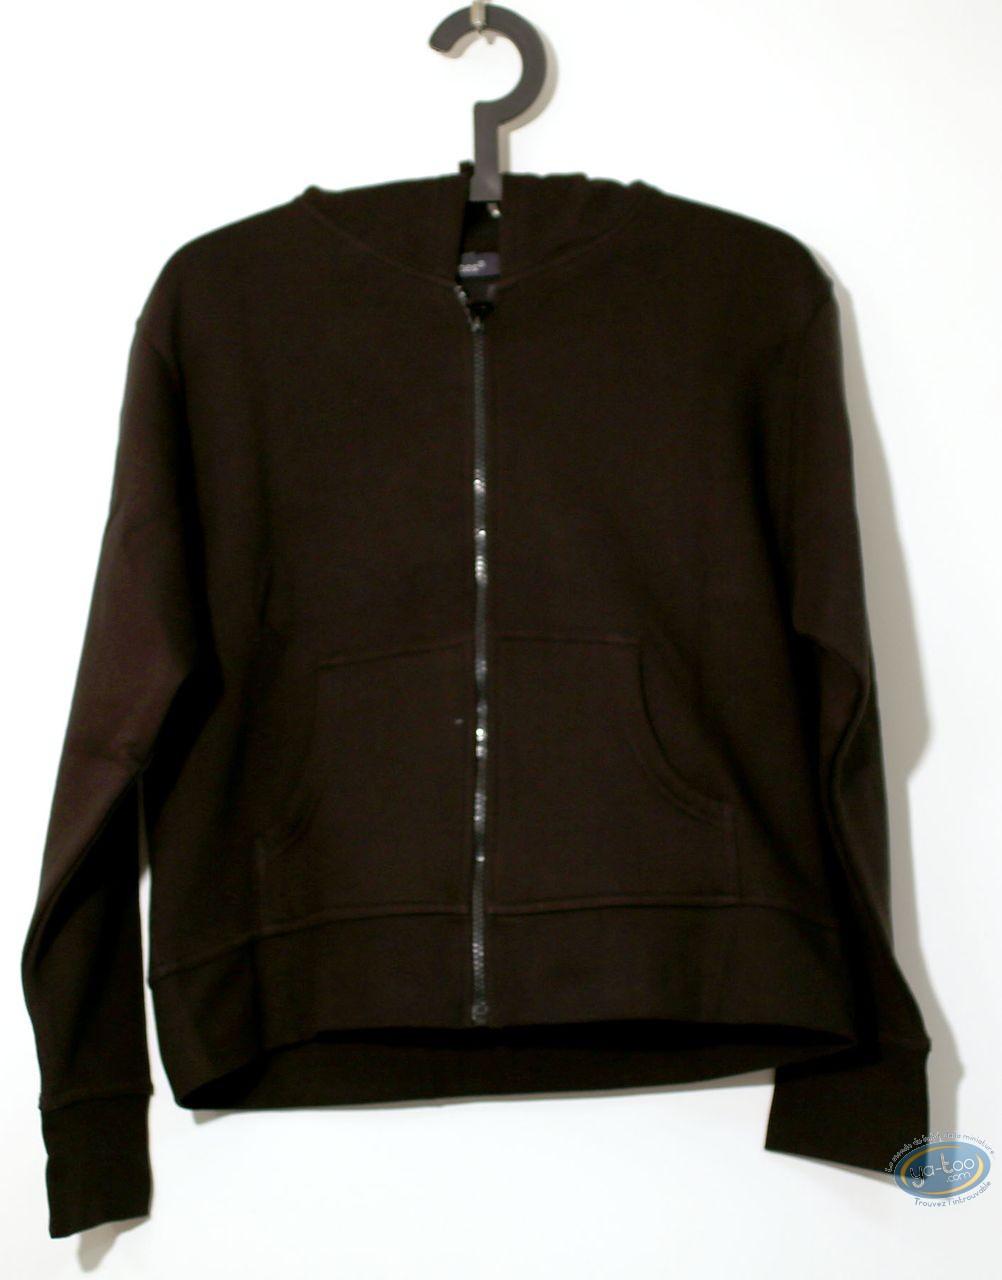 Clothes, Corto Maltese : Sweat-shirt, Corto Maltese : Hood Black 04-03 size XS